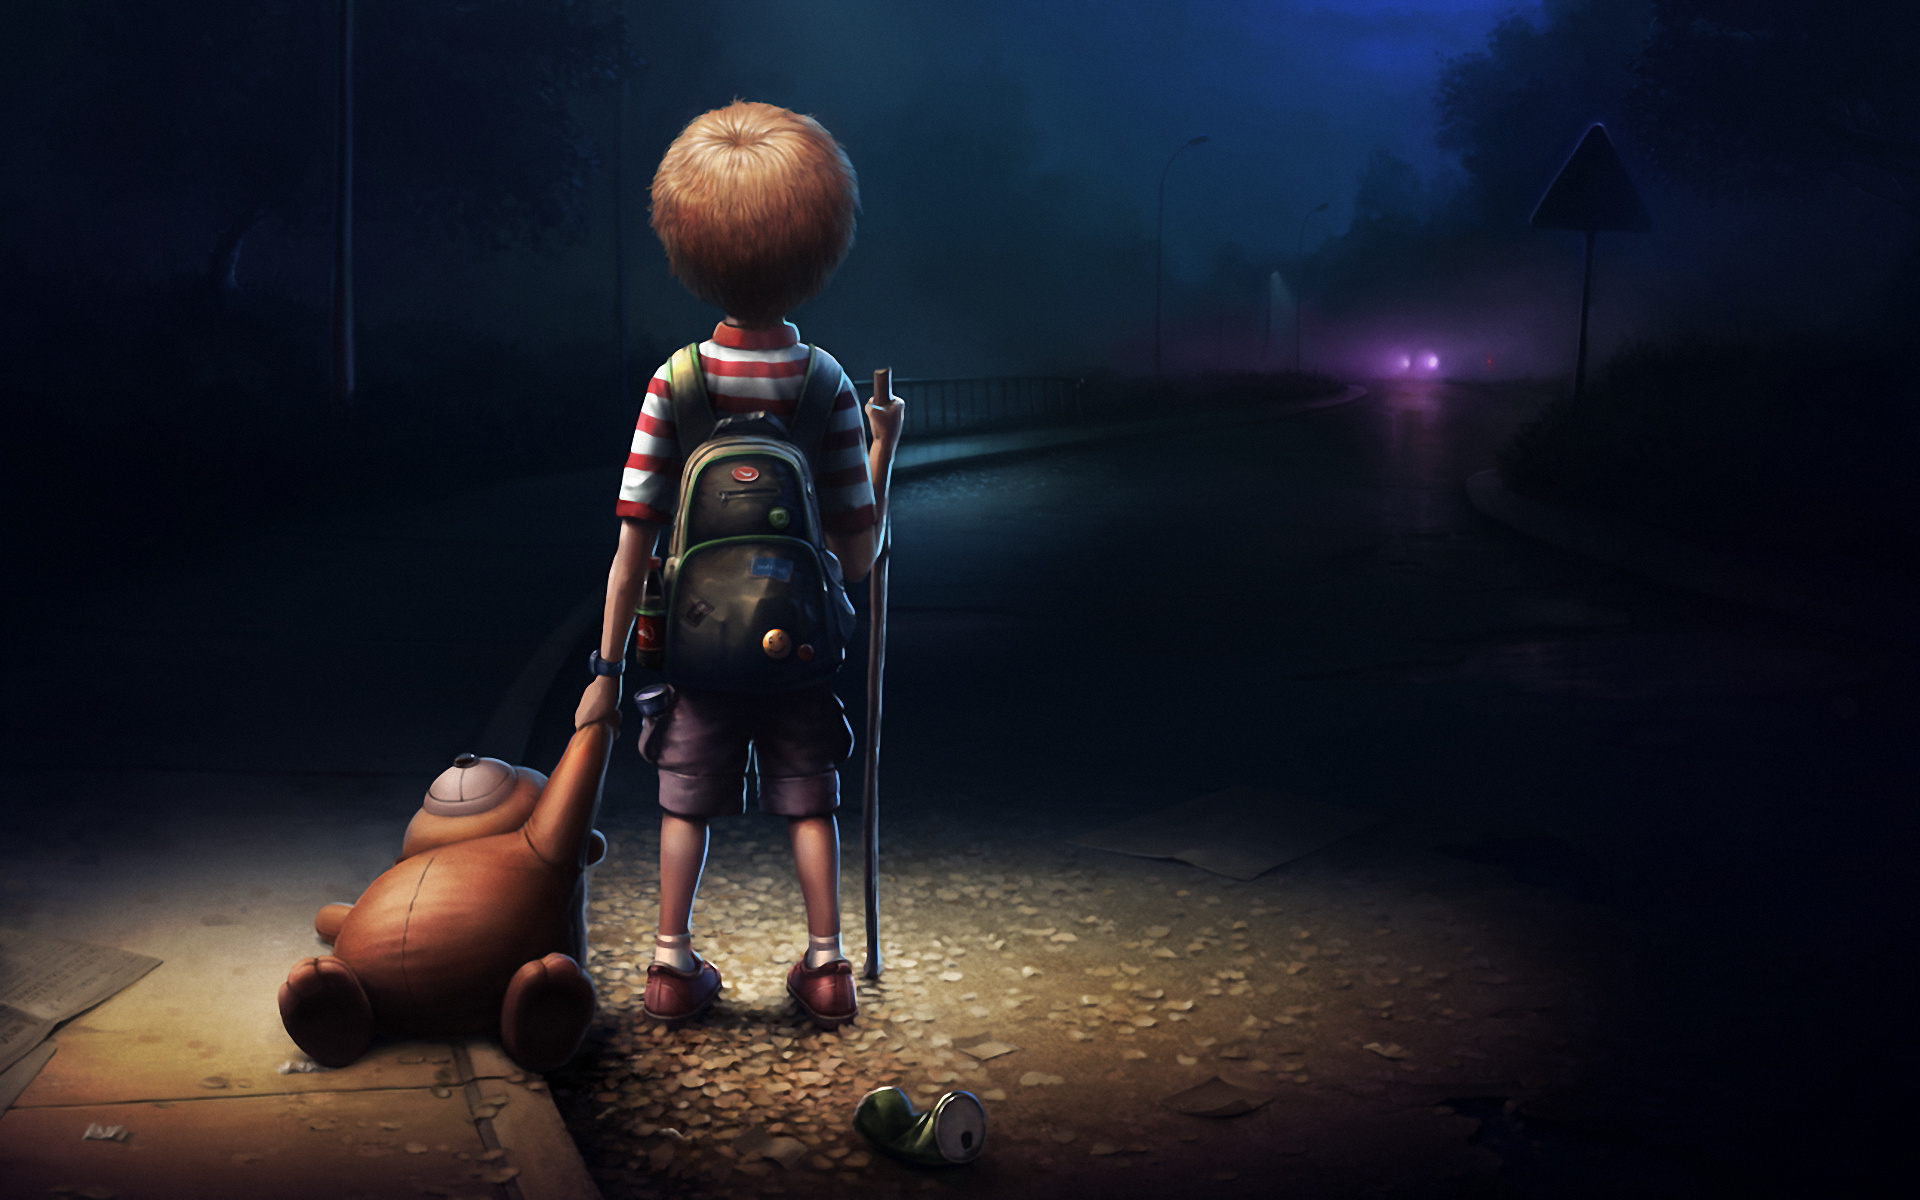 Boy alone darkness